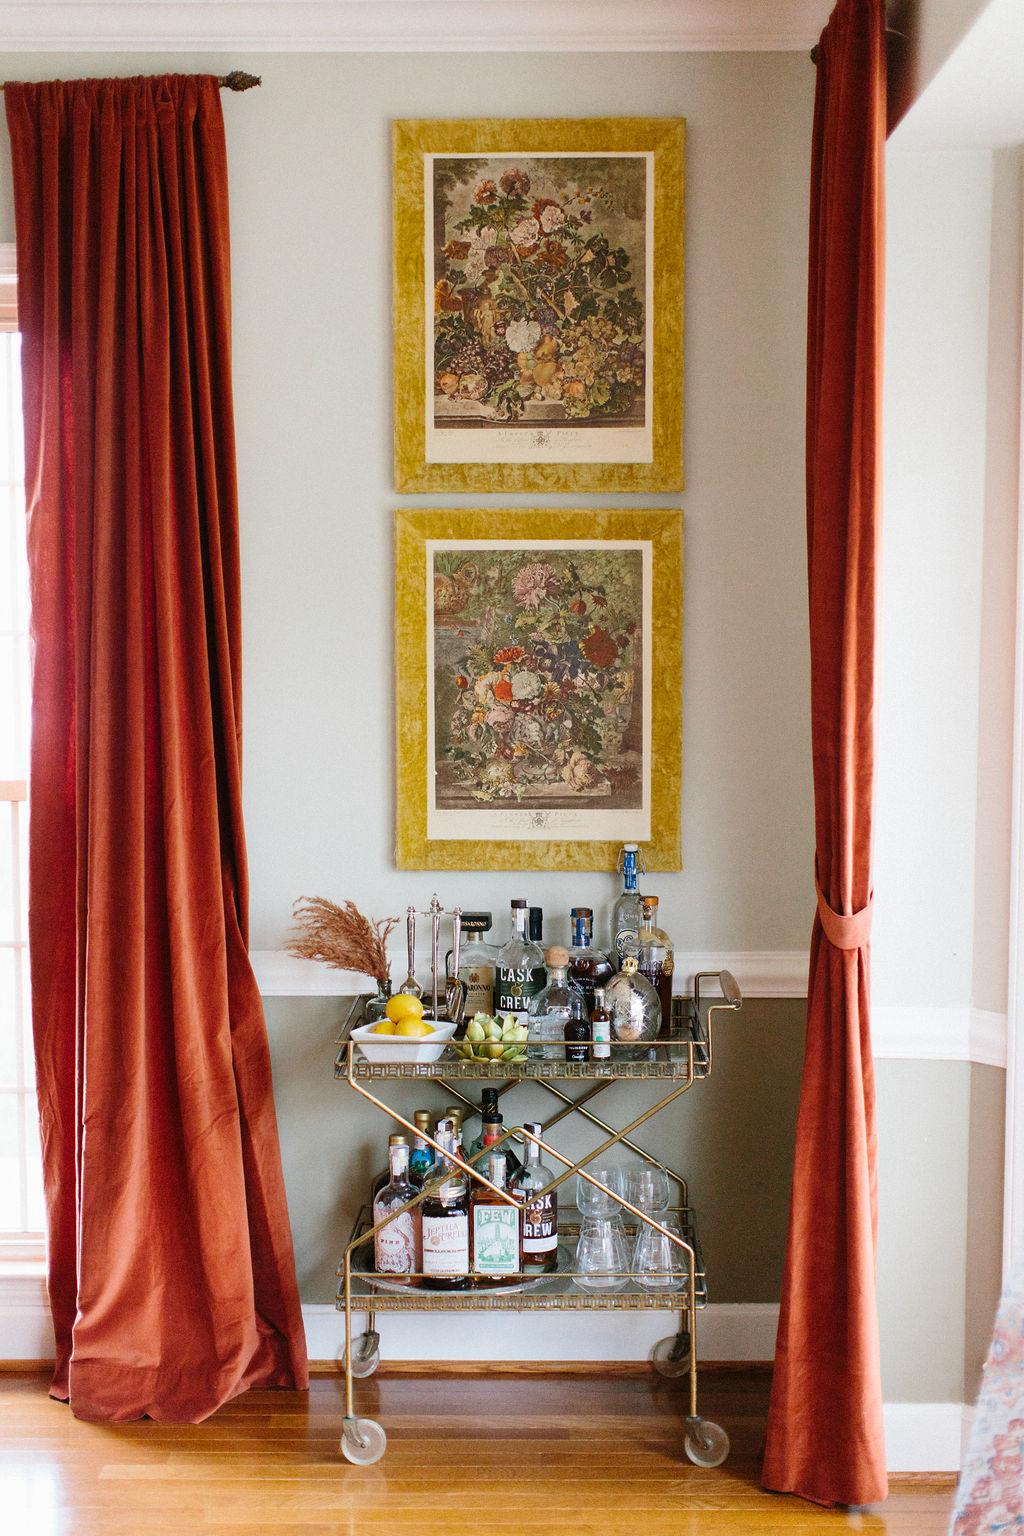 Journey-Jacobs-Design-Studio-Louisville-Residential-Commercial-Hospitality-Interior-Design-Traditional-Modern-4.JPG